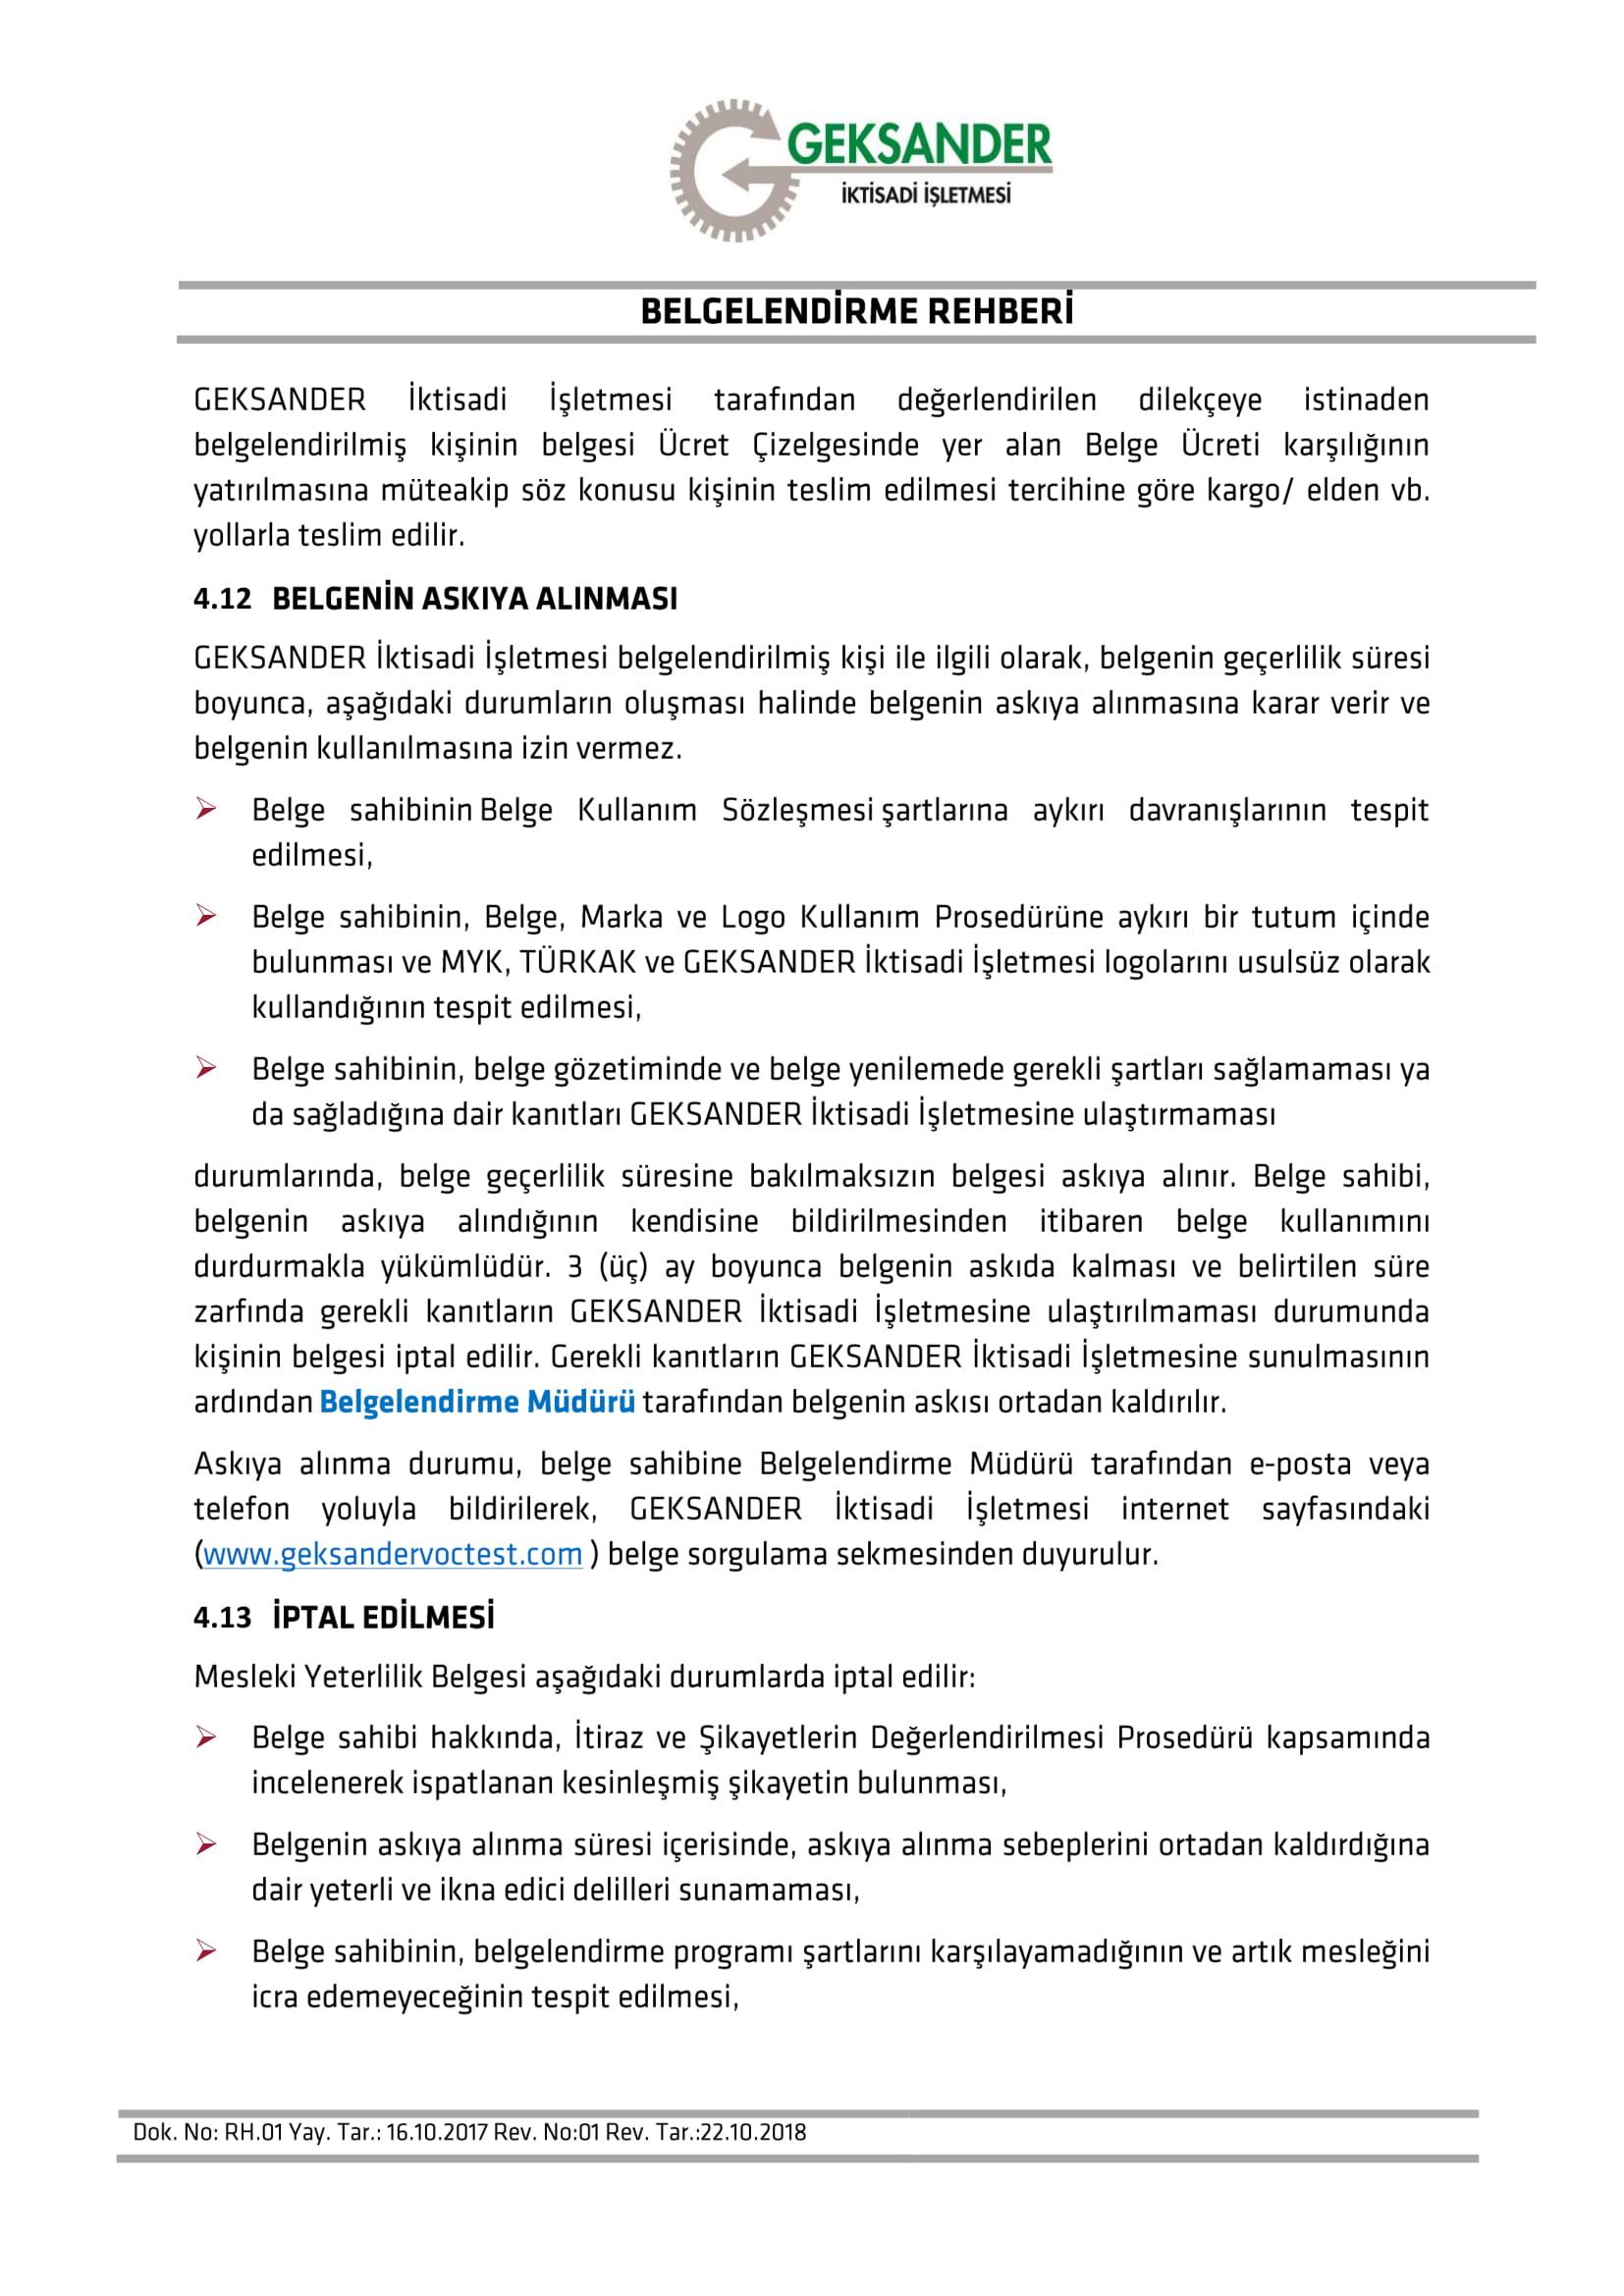 RH.-01-Belgelendirme-Rehberi-REV01[1]-10